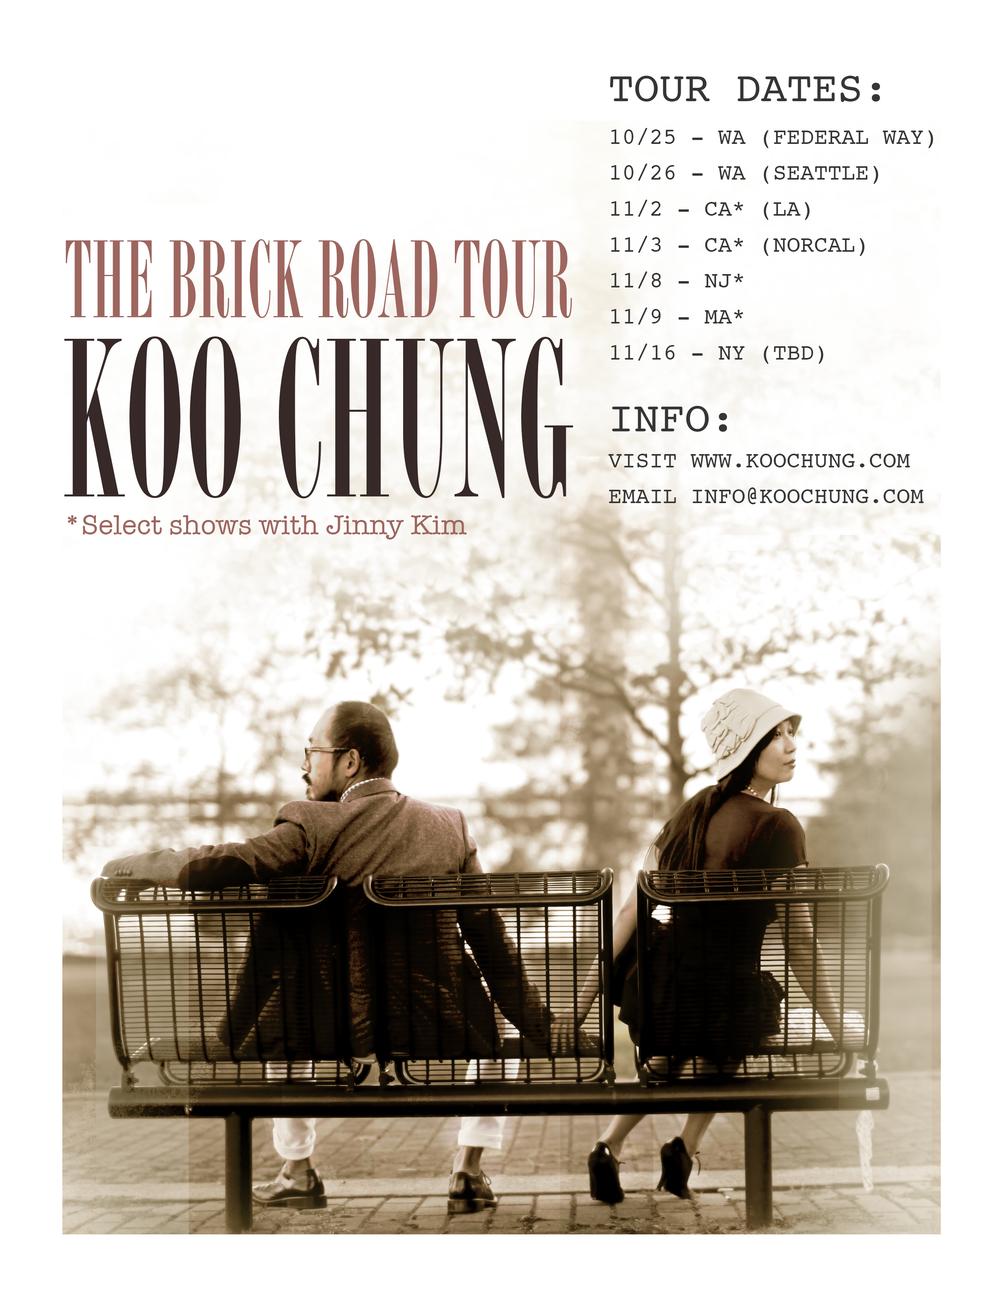 Brick Road Tour 2013.jpg